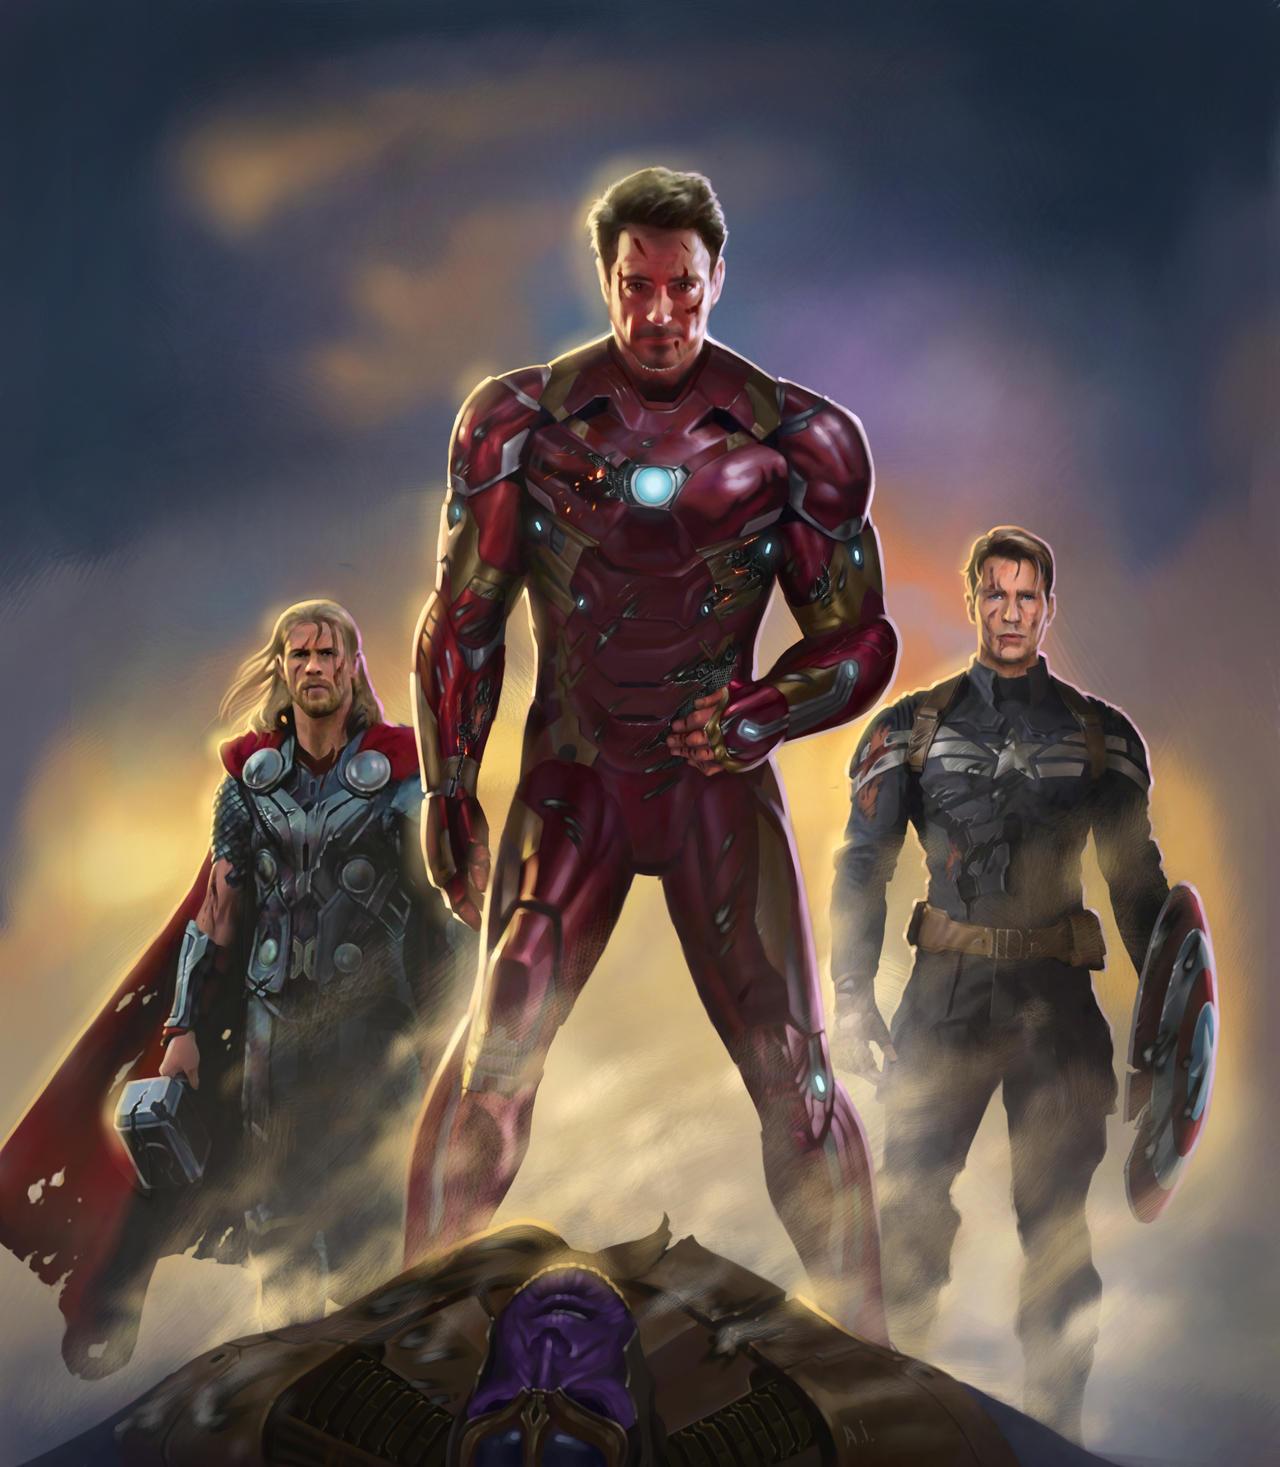 Avengers Infinity War By AvdeevIgor On DeviantArt